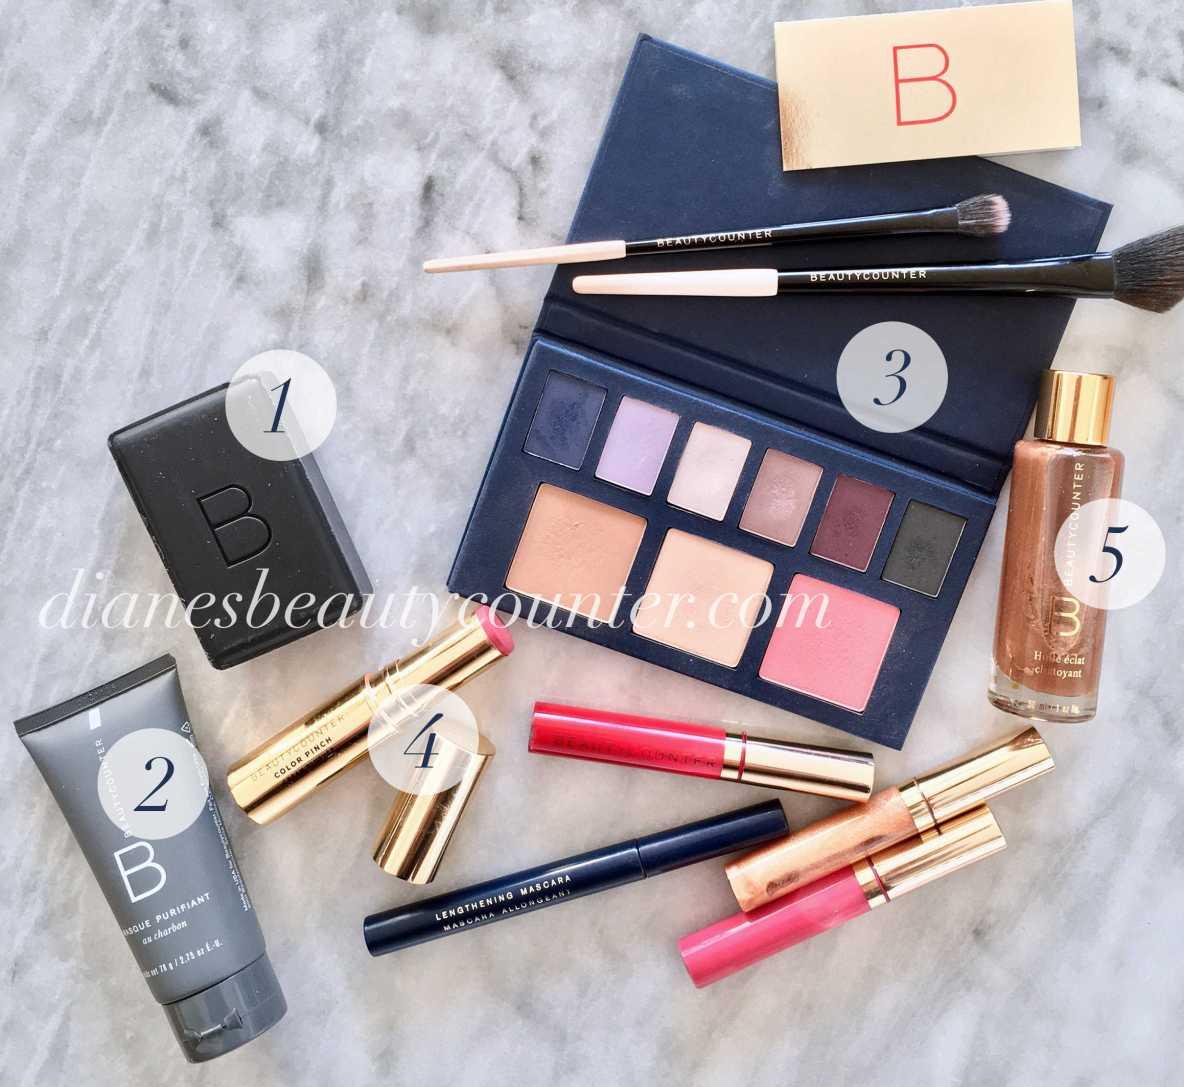 Diane's Favorite Beautycounter picks | dianesbeautycounter.com